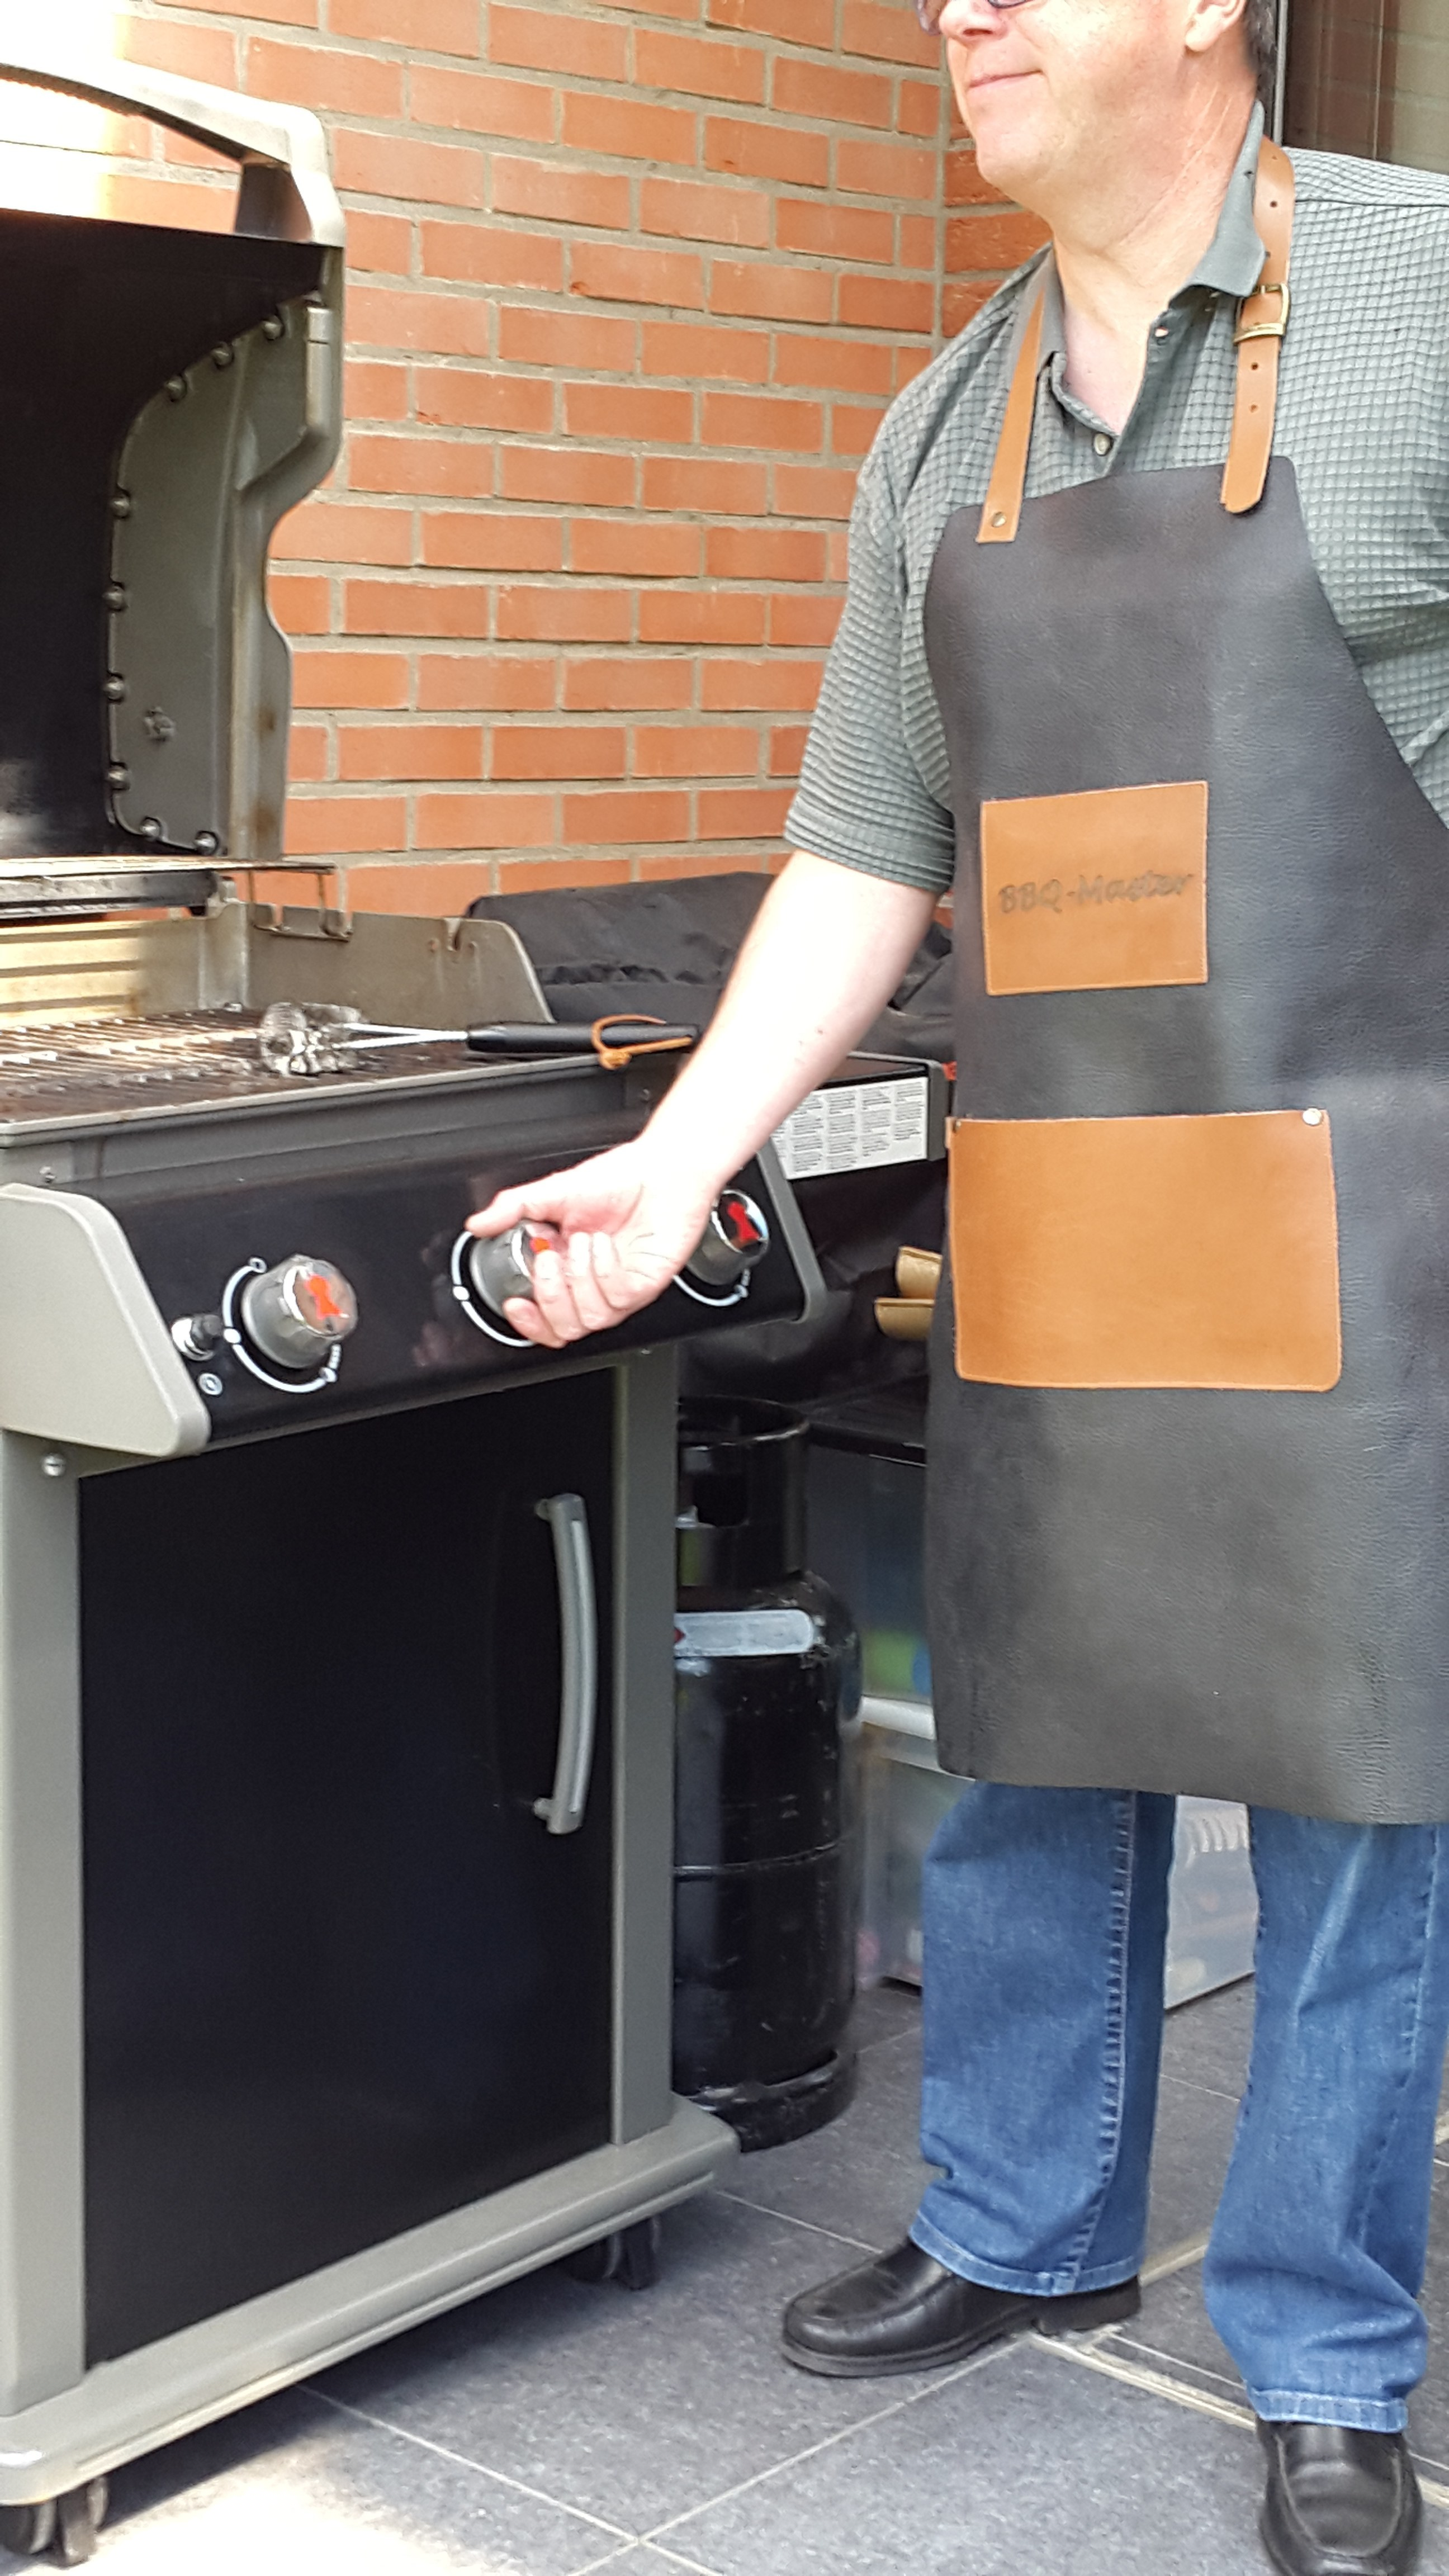 Barbecue schorten leder